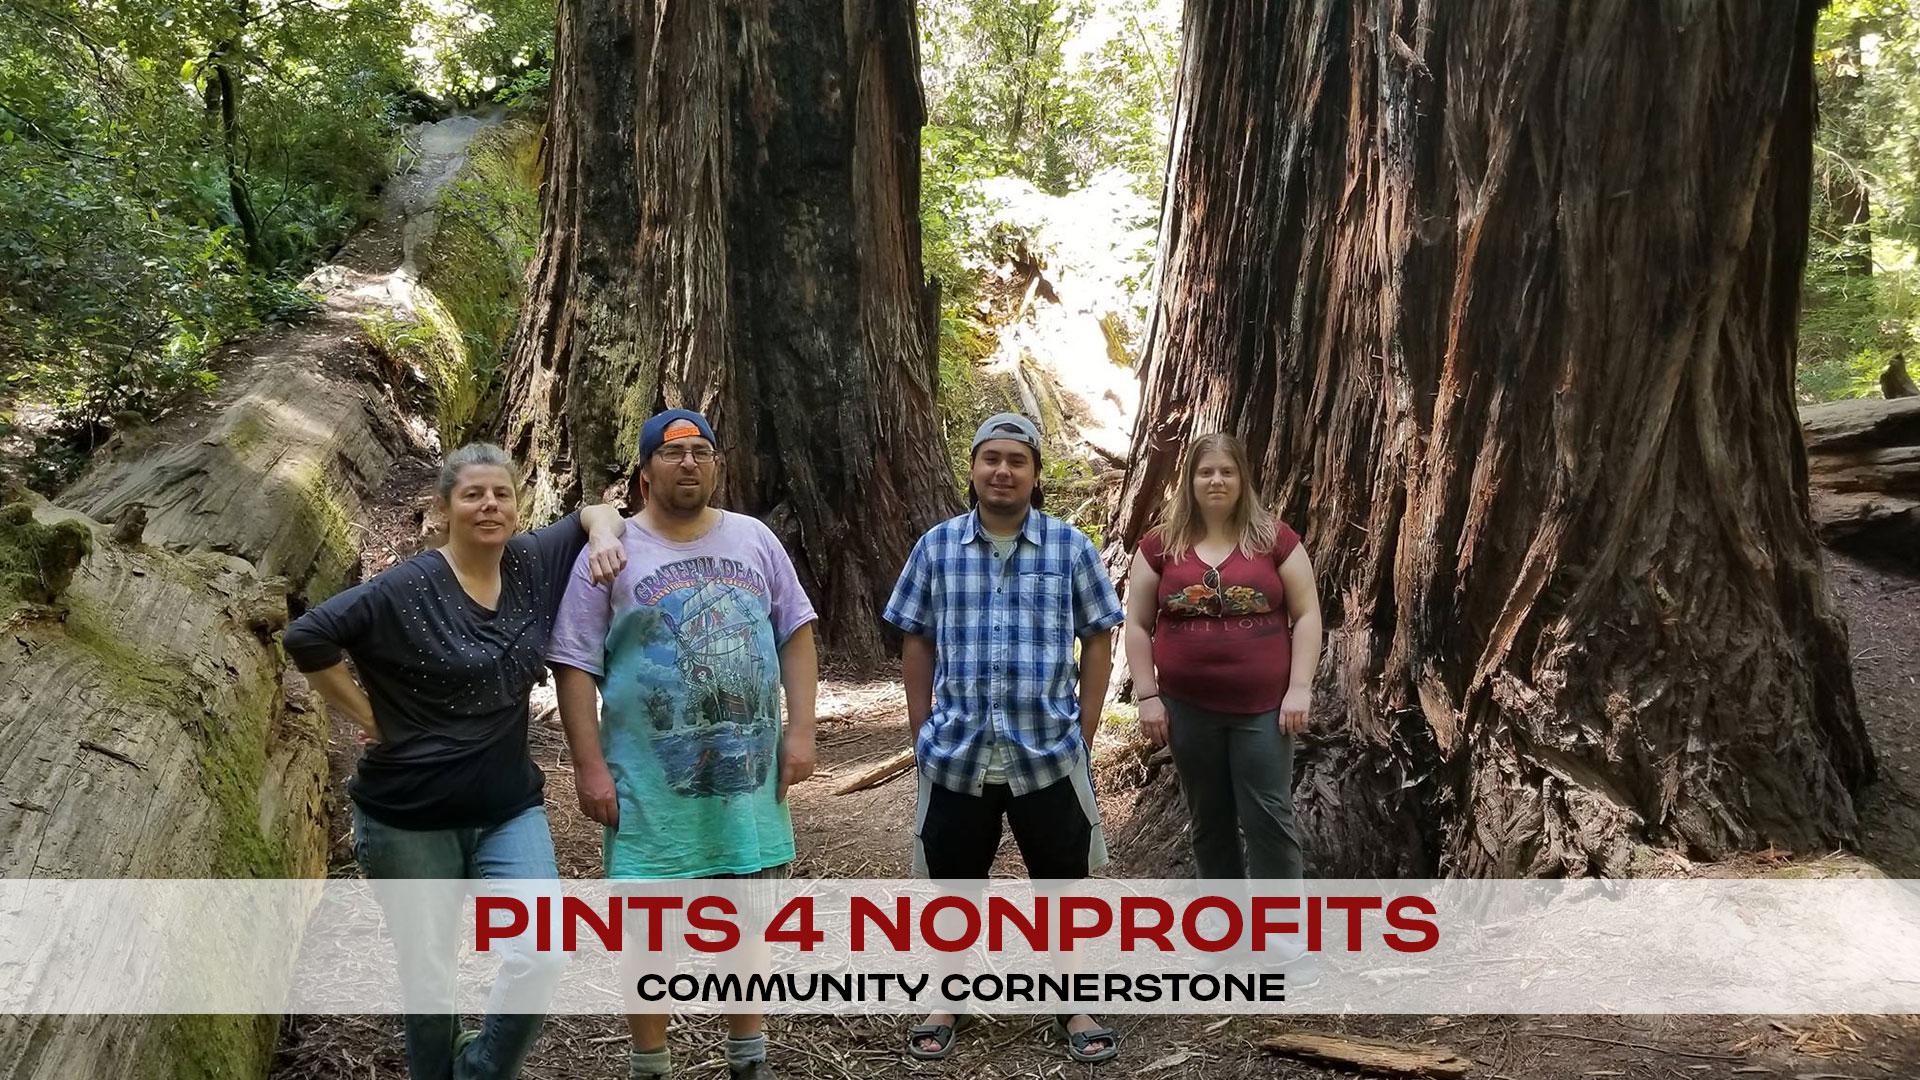 p4np-community-cornerstone.jpg